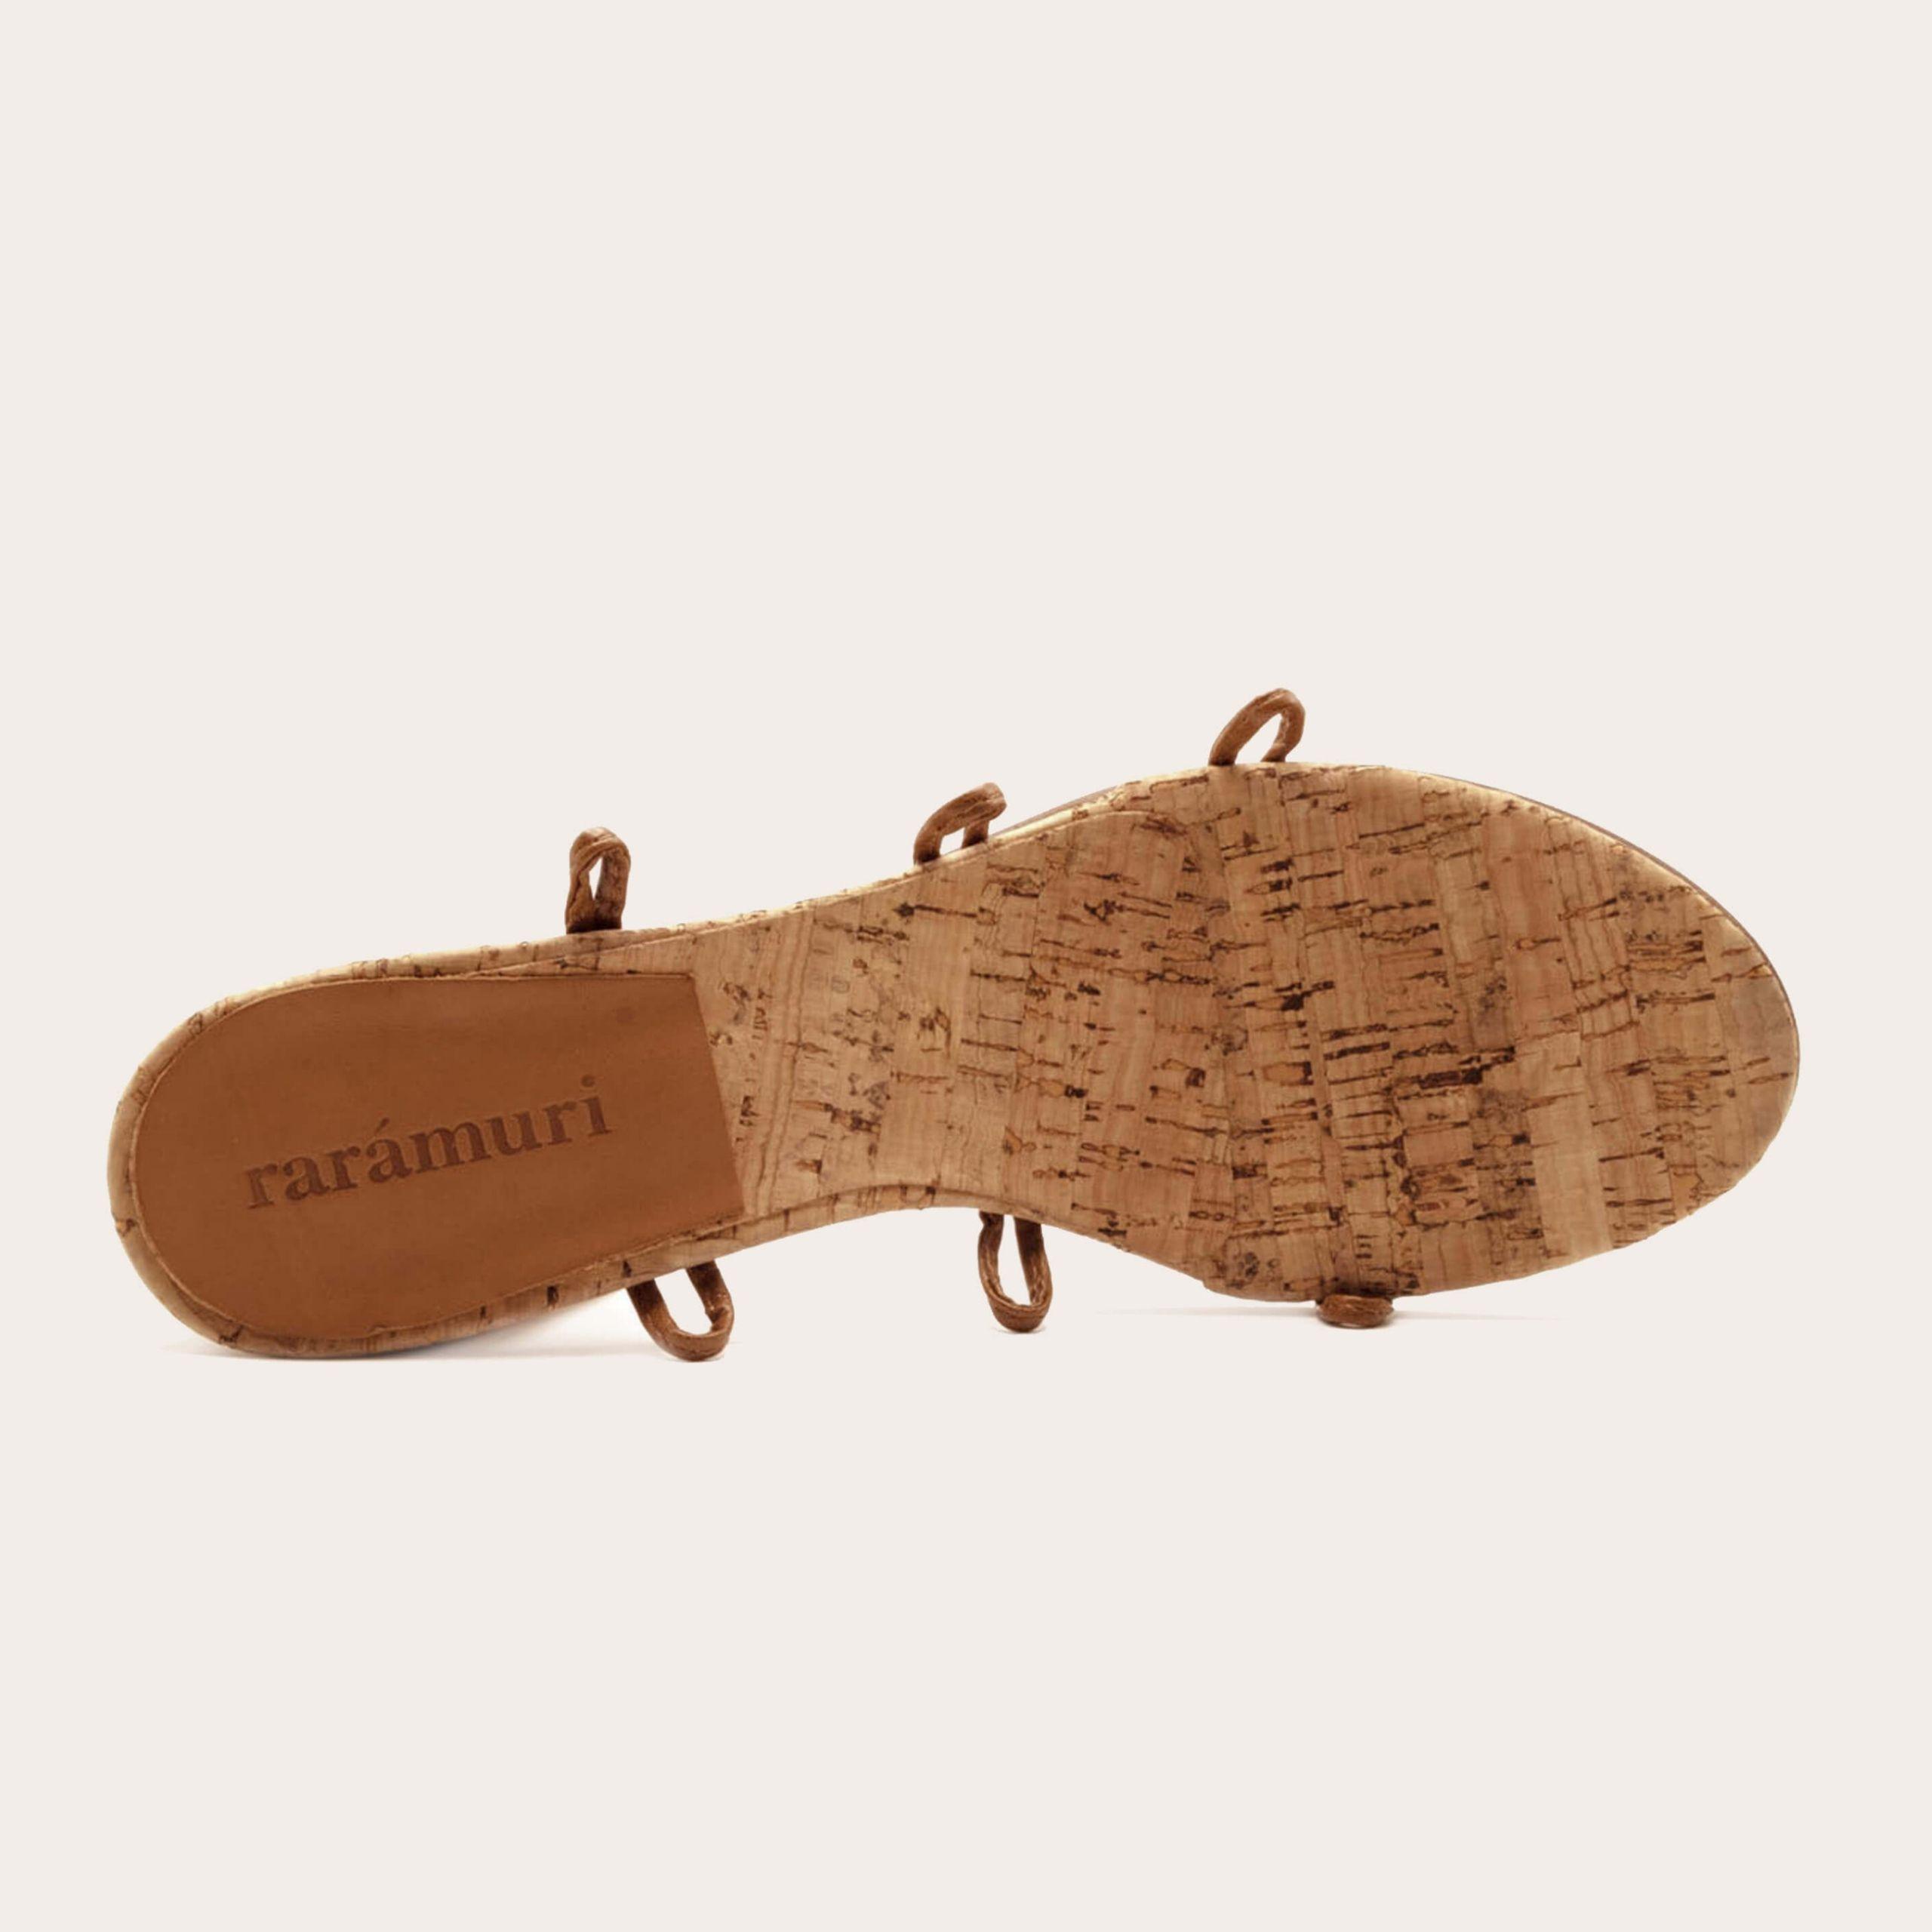 camila_3_lintsandalen sandals travelsandals vegan sustainable sandals wikkelsandalen